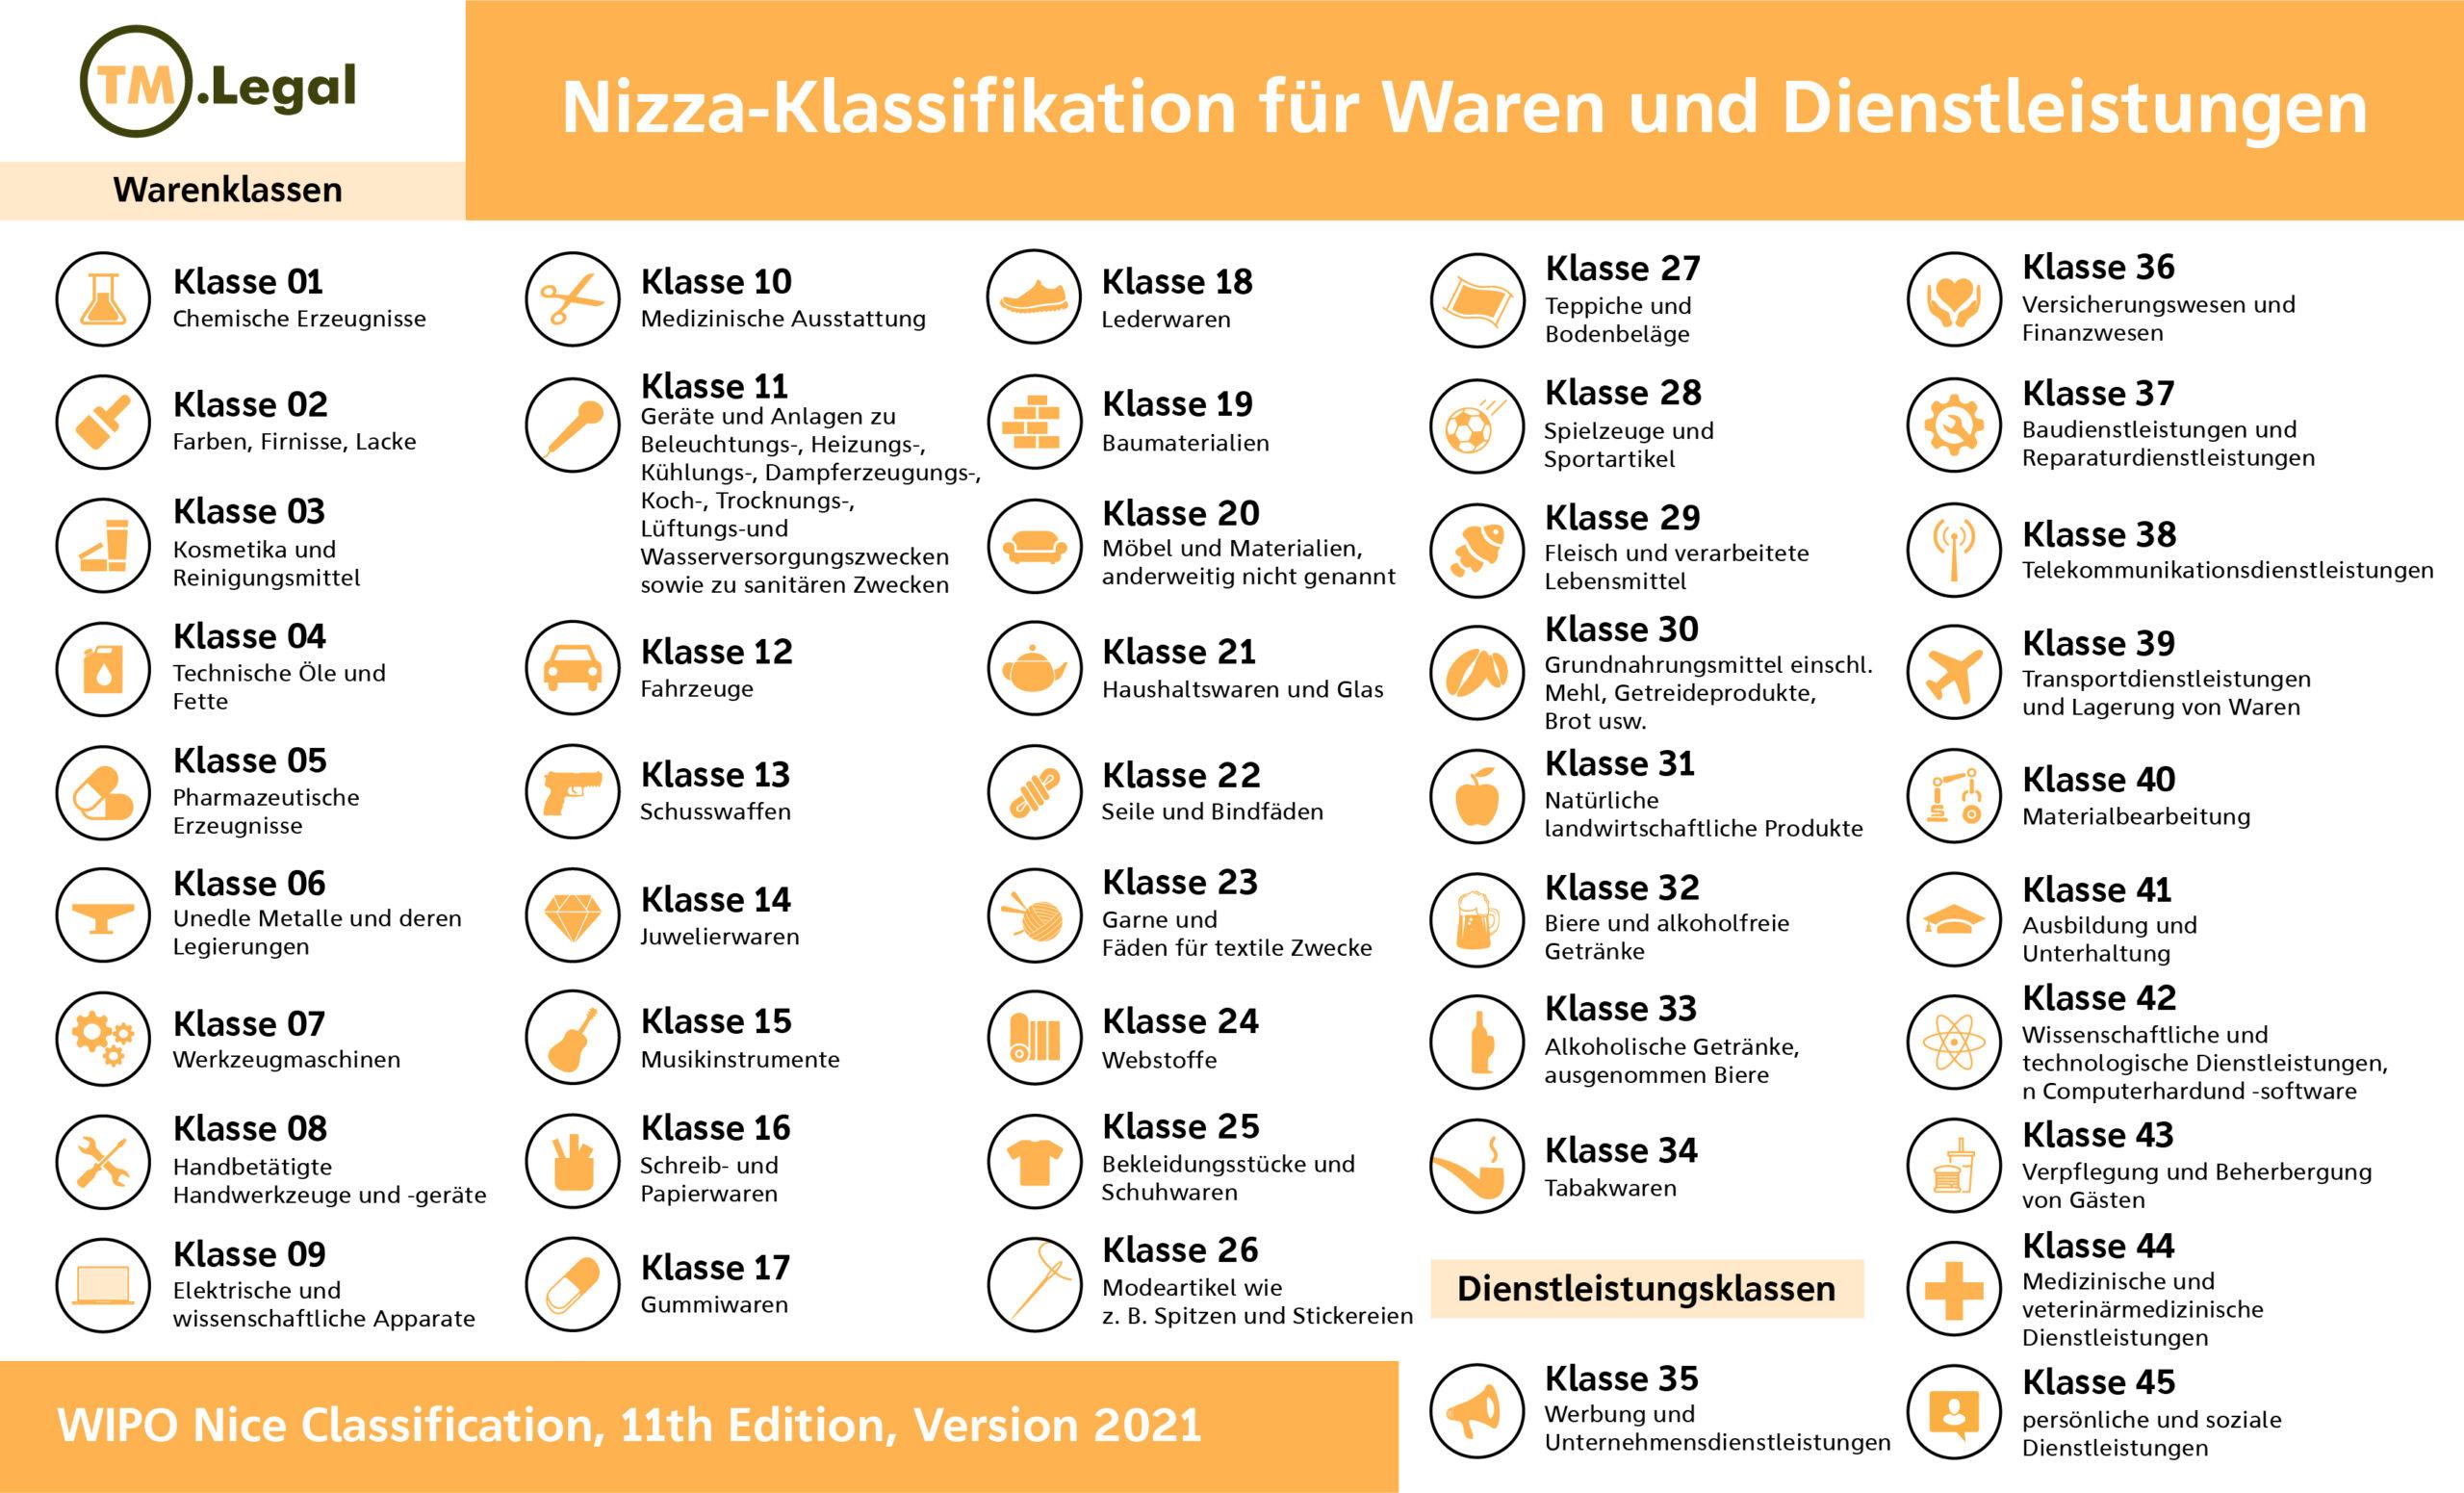 nizza klassifikation